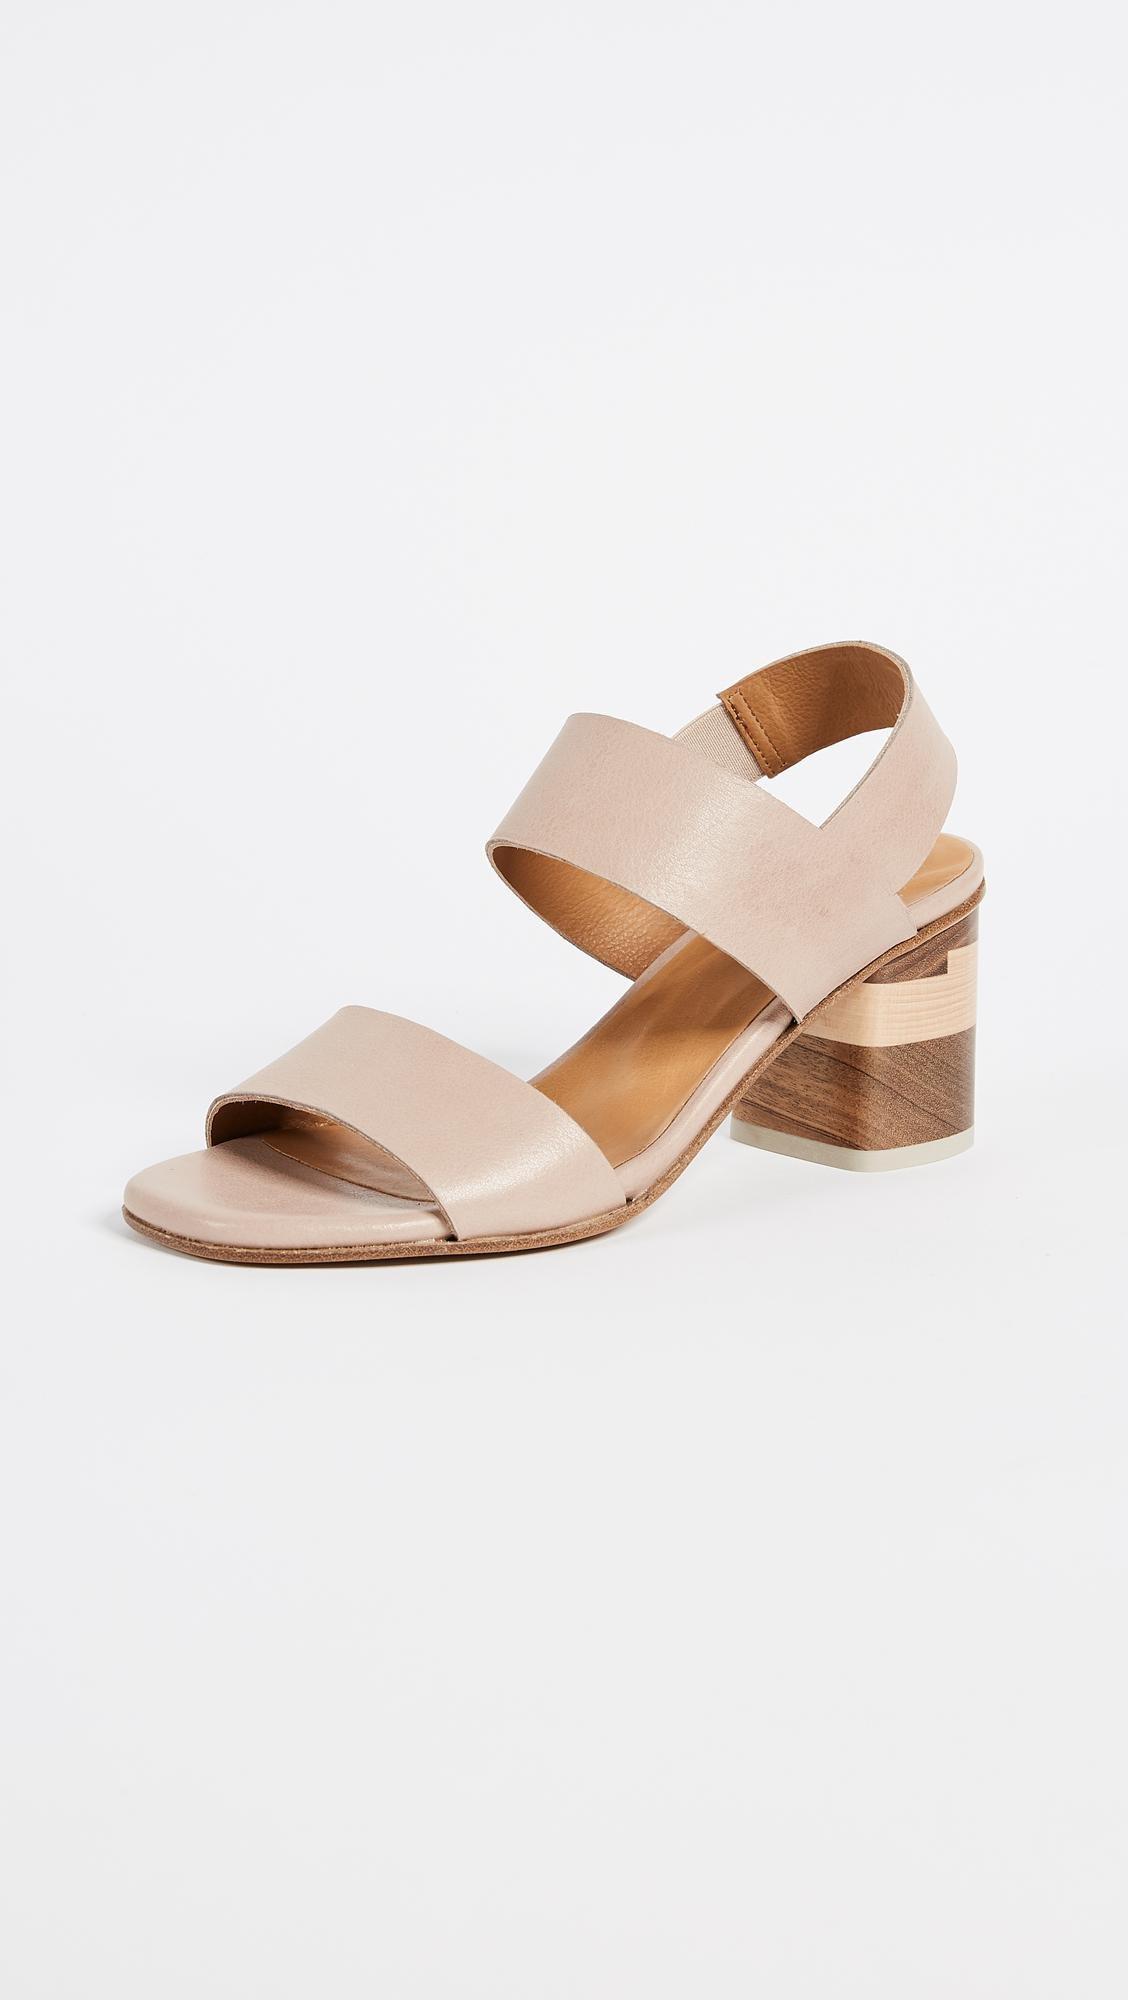 8bfe8f1cf Coclico Bask Block Heel Sandals - Lyst